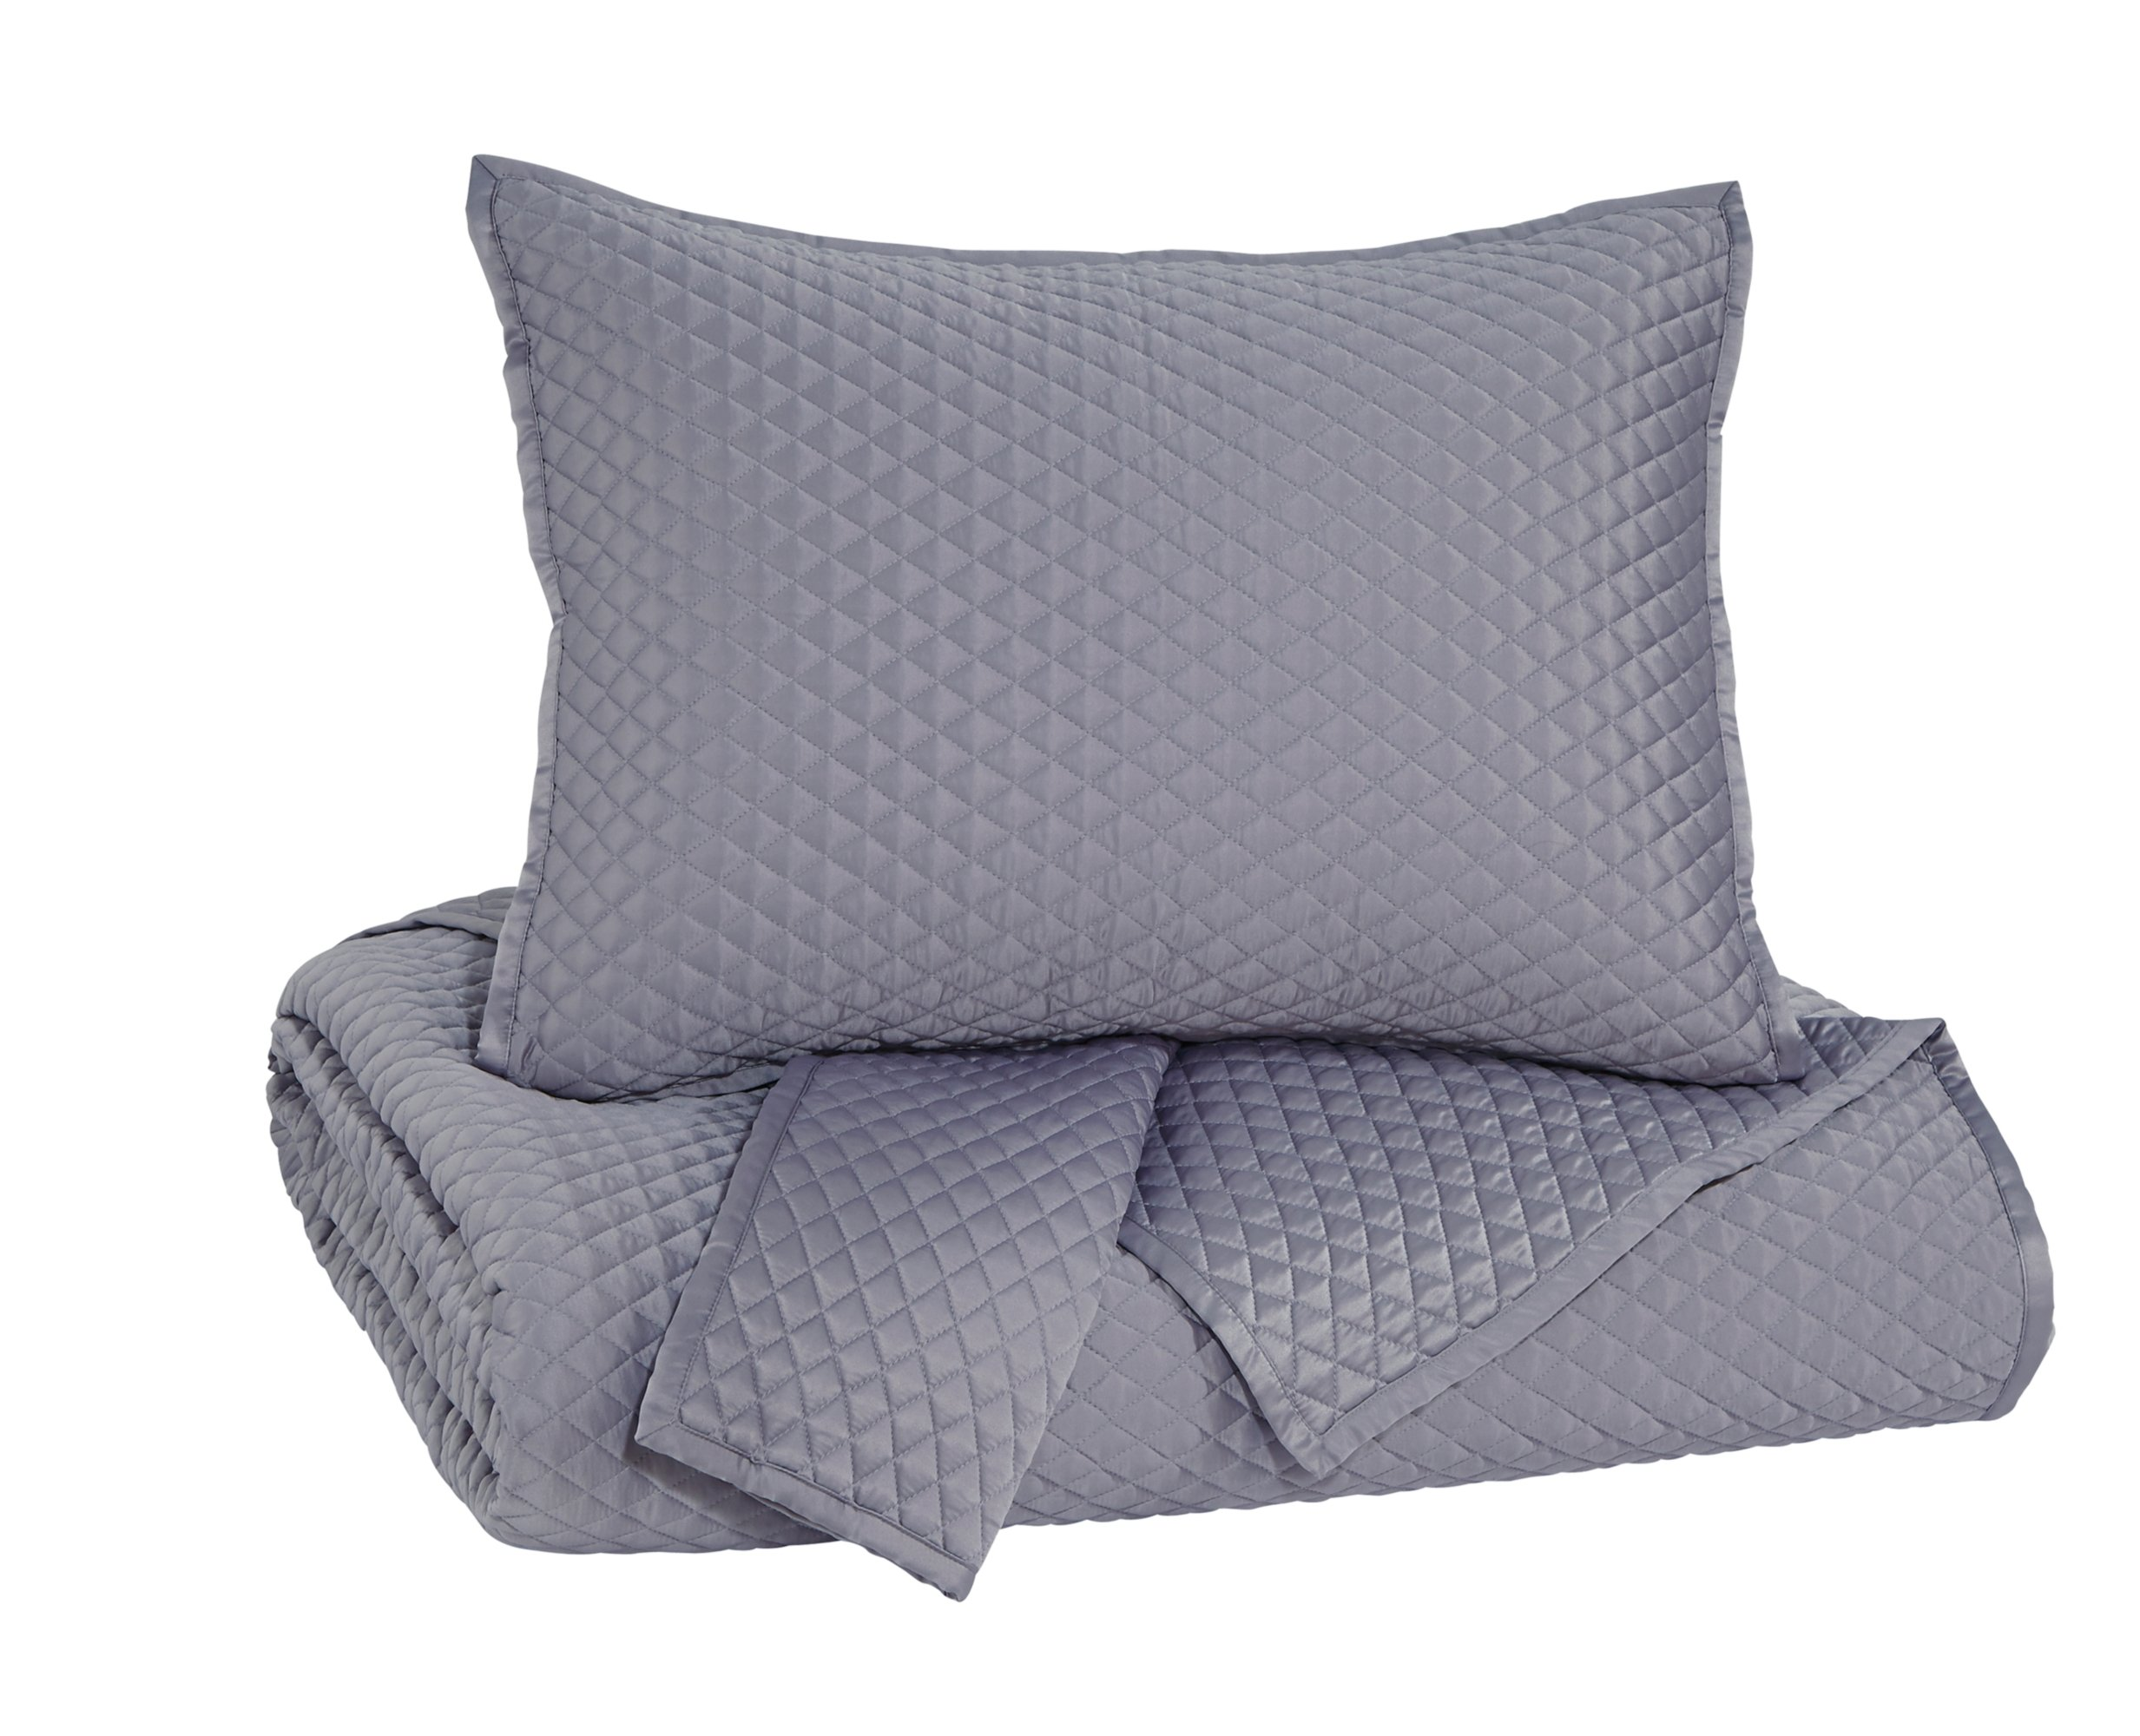 Ashley Furniture Signature Design - Dietrick Quilt Set - Queen - Contains 3 Pieces - Solid Color, Gray